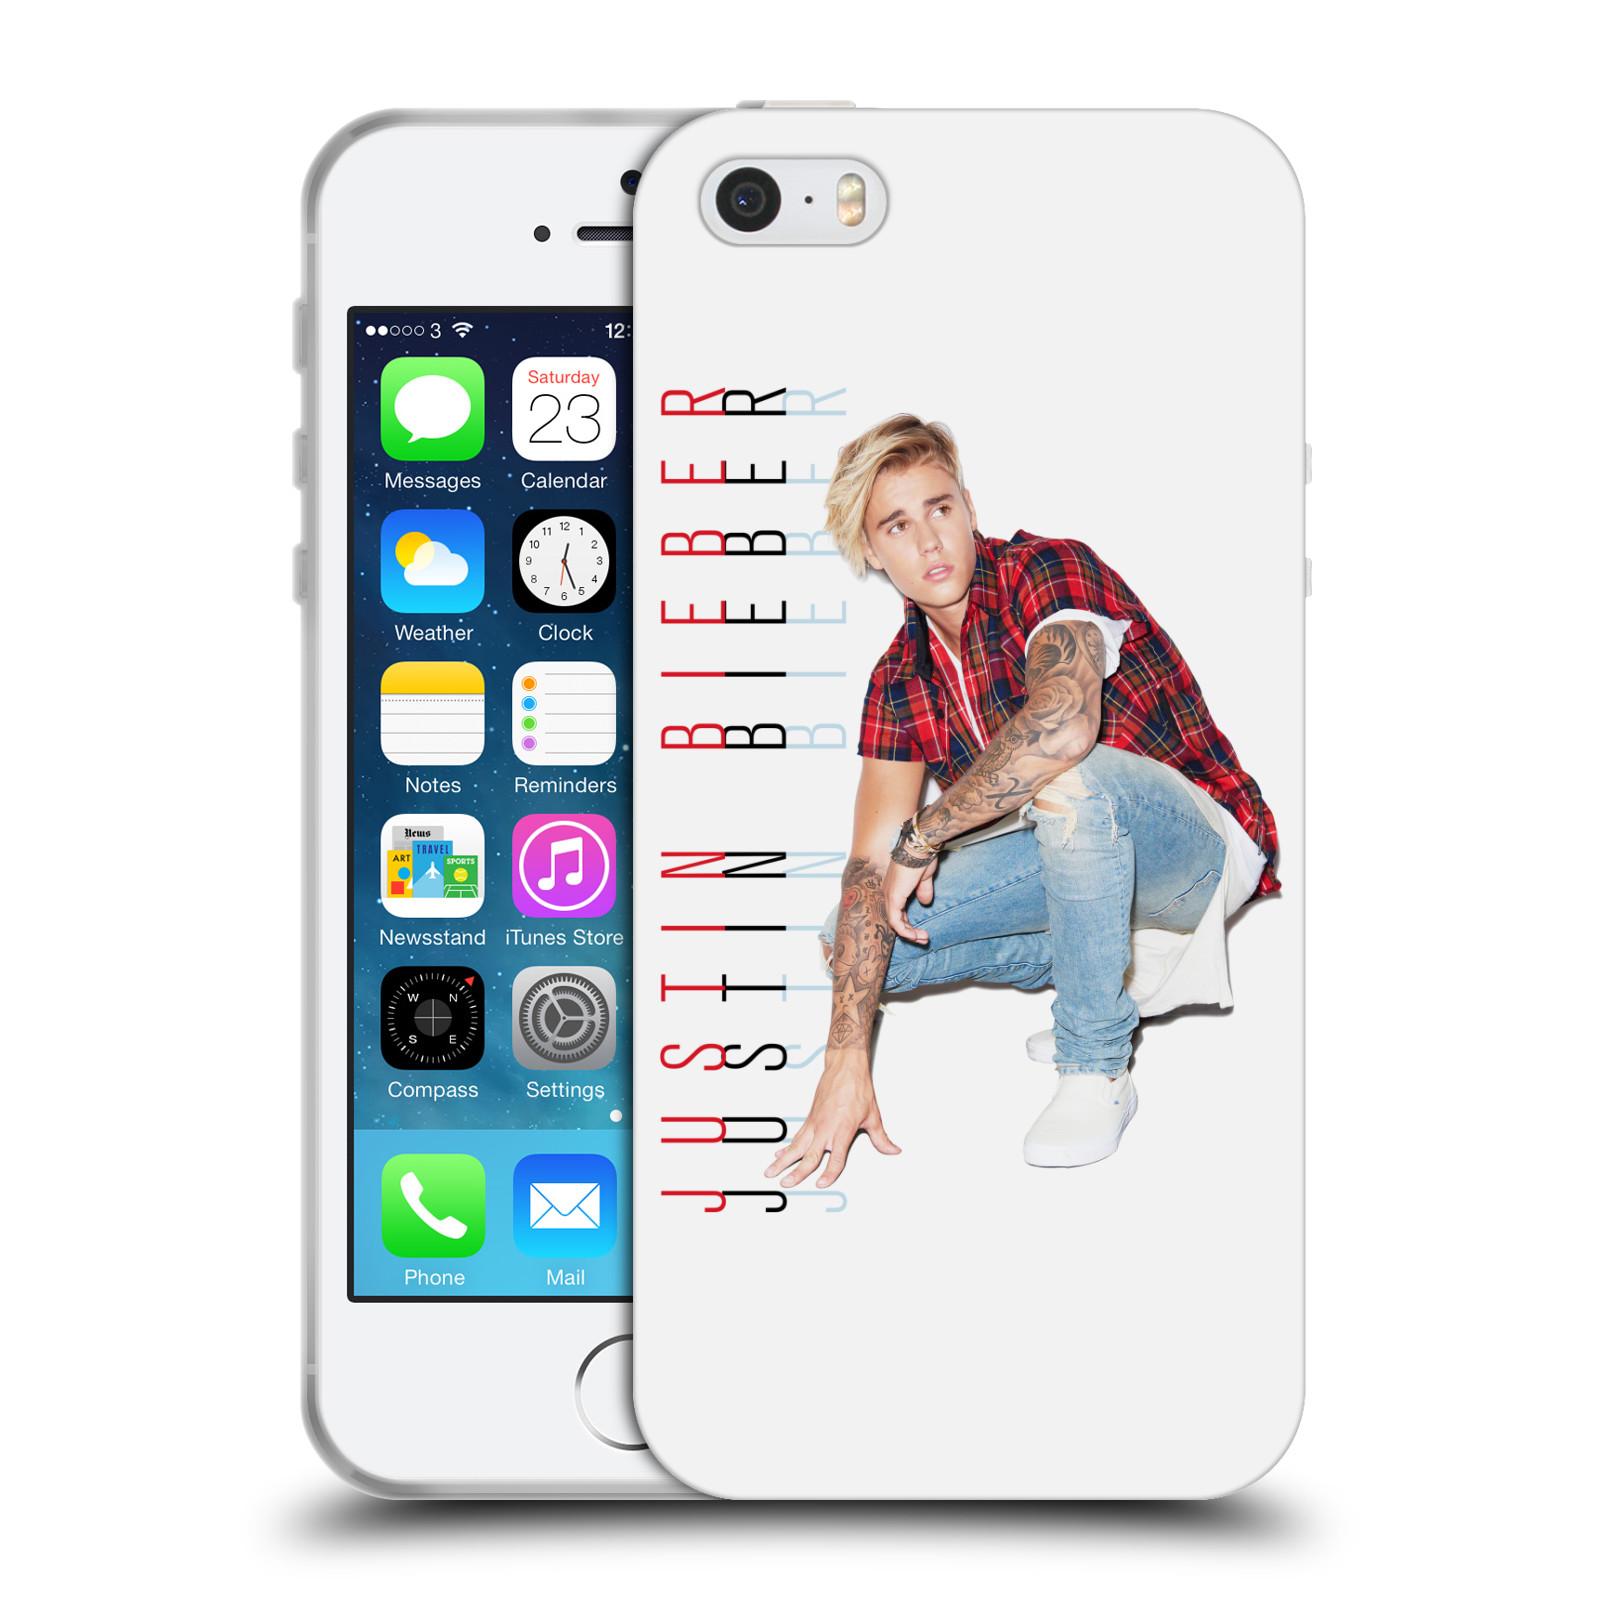 HEAD CASE silikonový obal na mobil Apple Iphone 5 / 5S originální potisk Justin Bieber Cropped